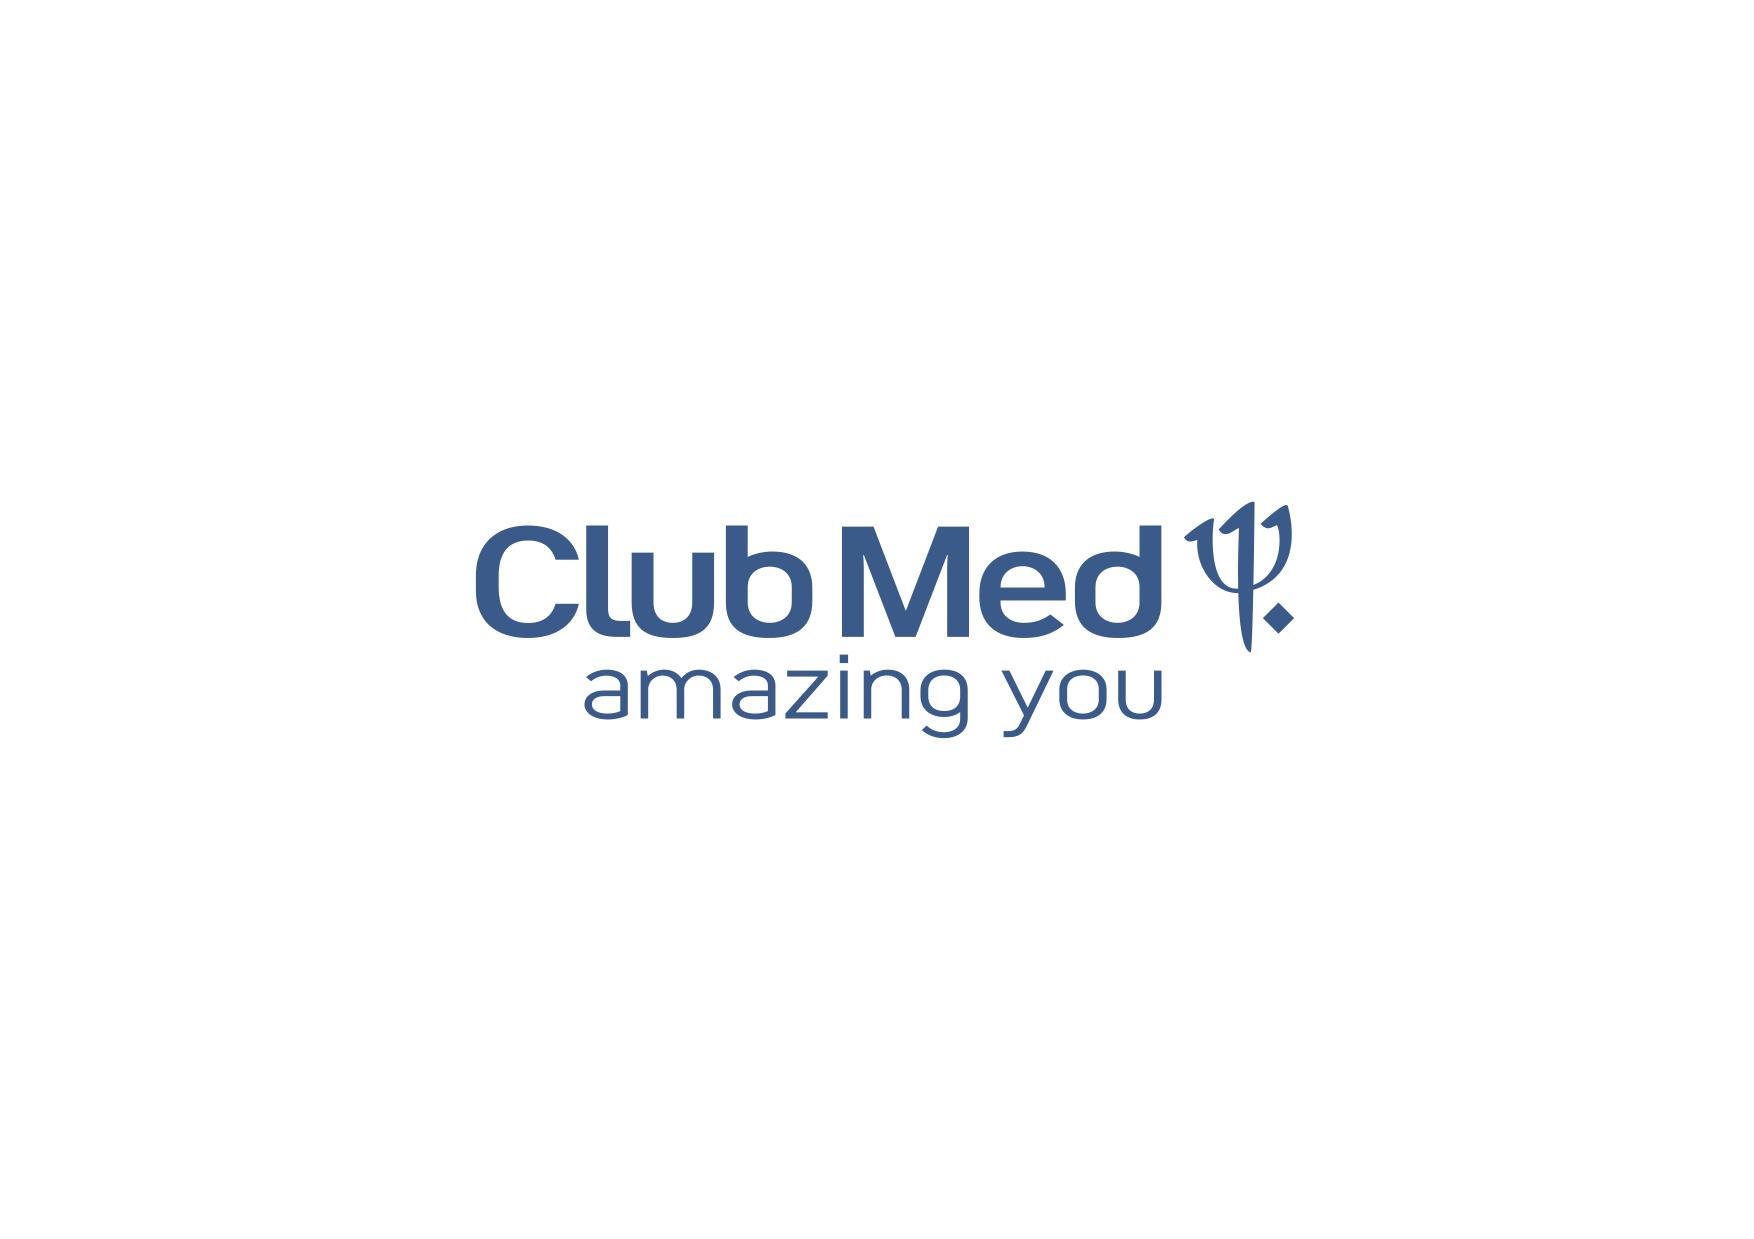 ClubMed_Logo AmazingYou_Blanc.png